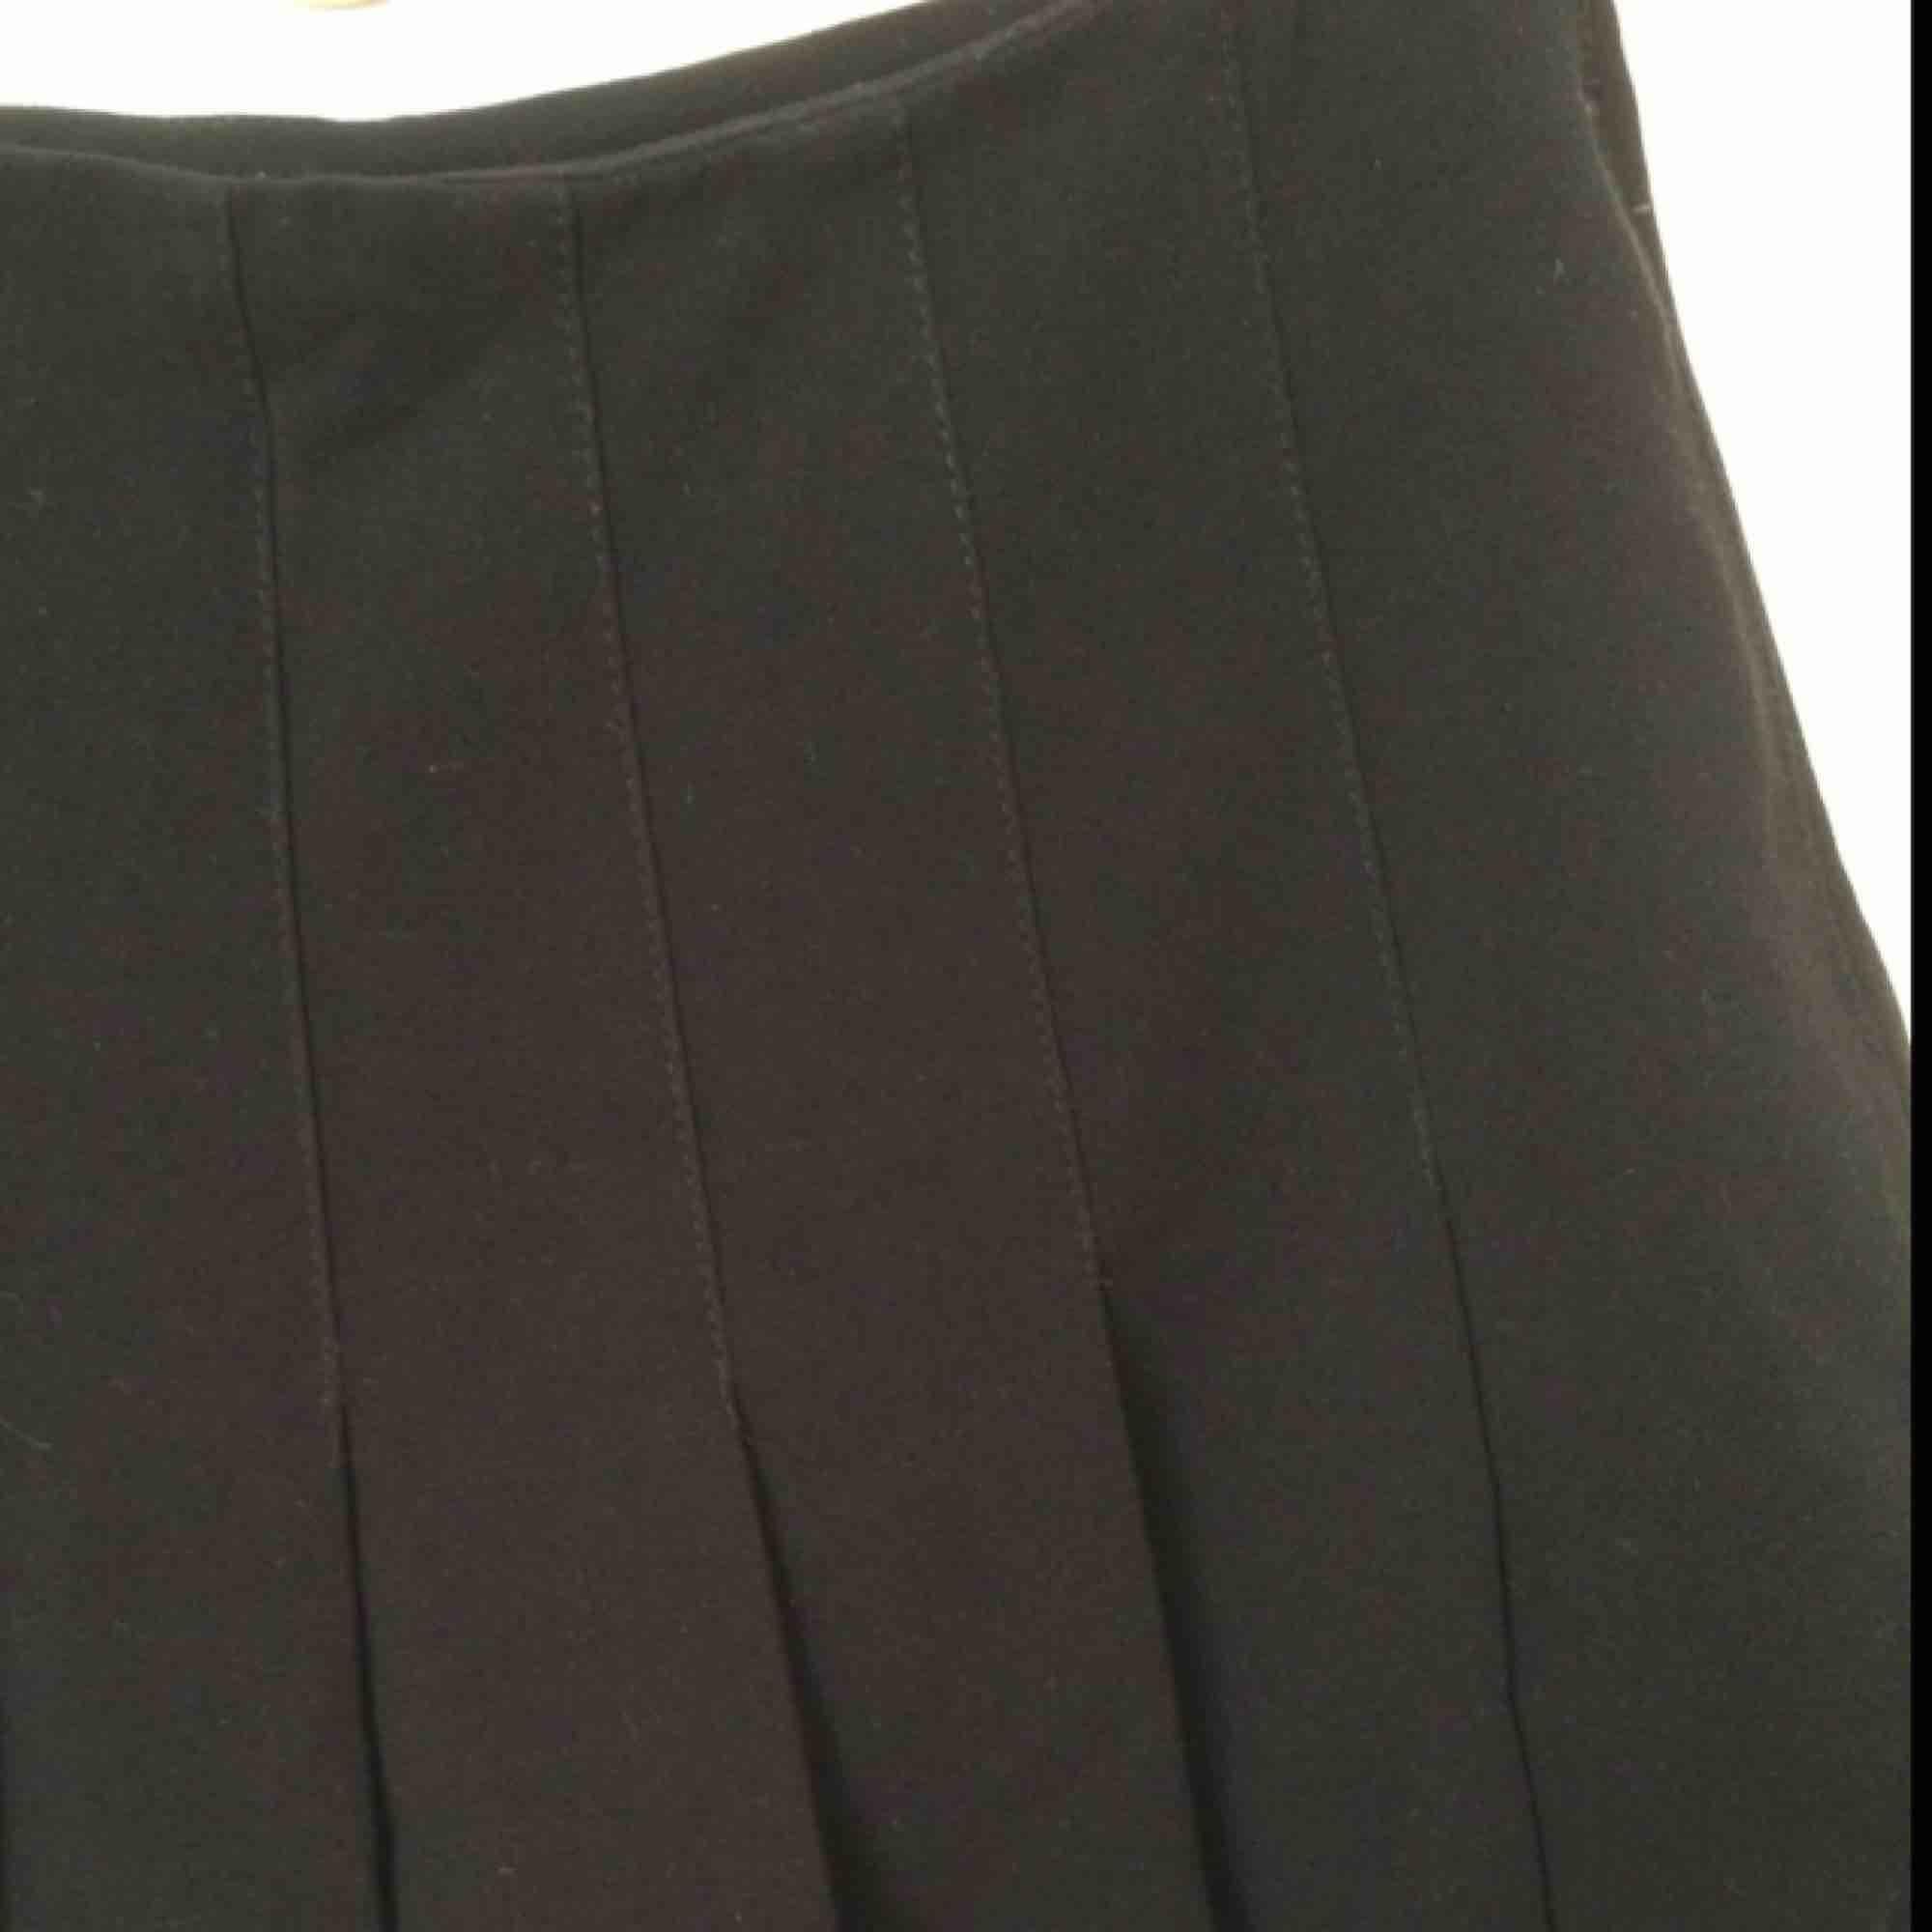 Jättefin plisserad svart kjol🌃 storlek 32/xxs. Kjolar.